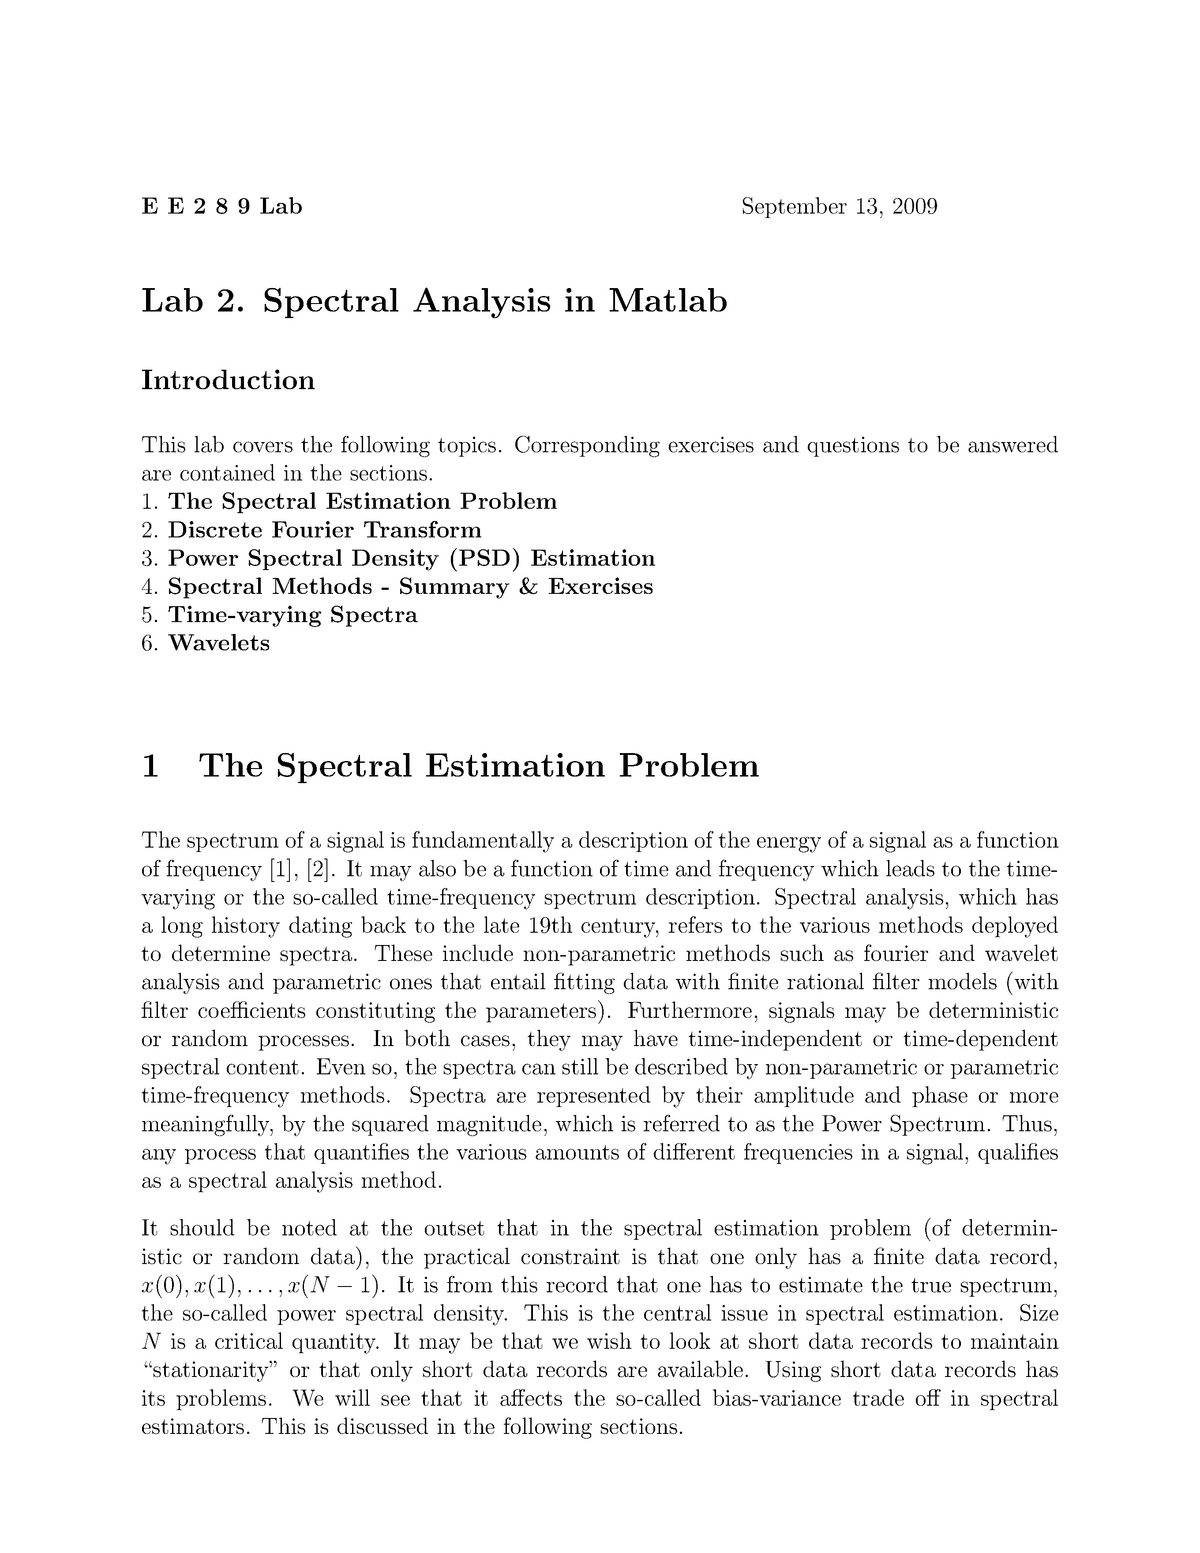 EE289 Sep 2009 Lab 2 - Spectral Analysis in Matlab - EE 289